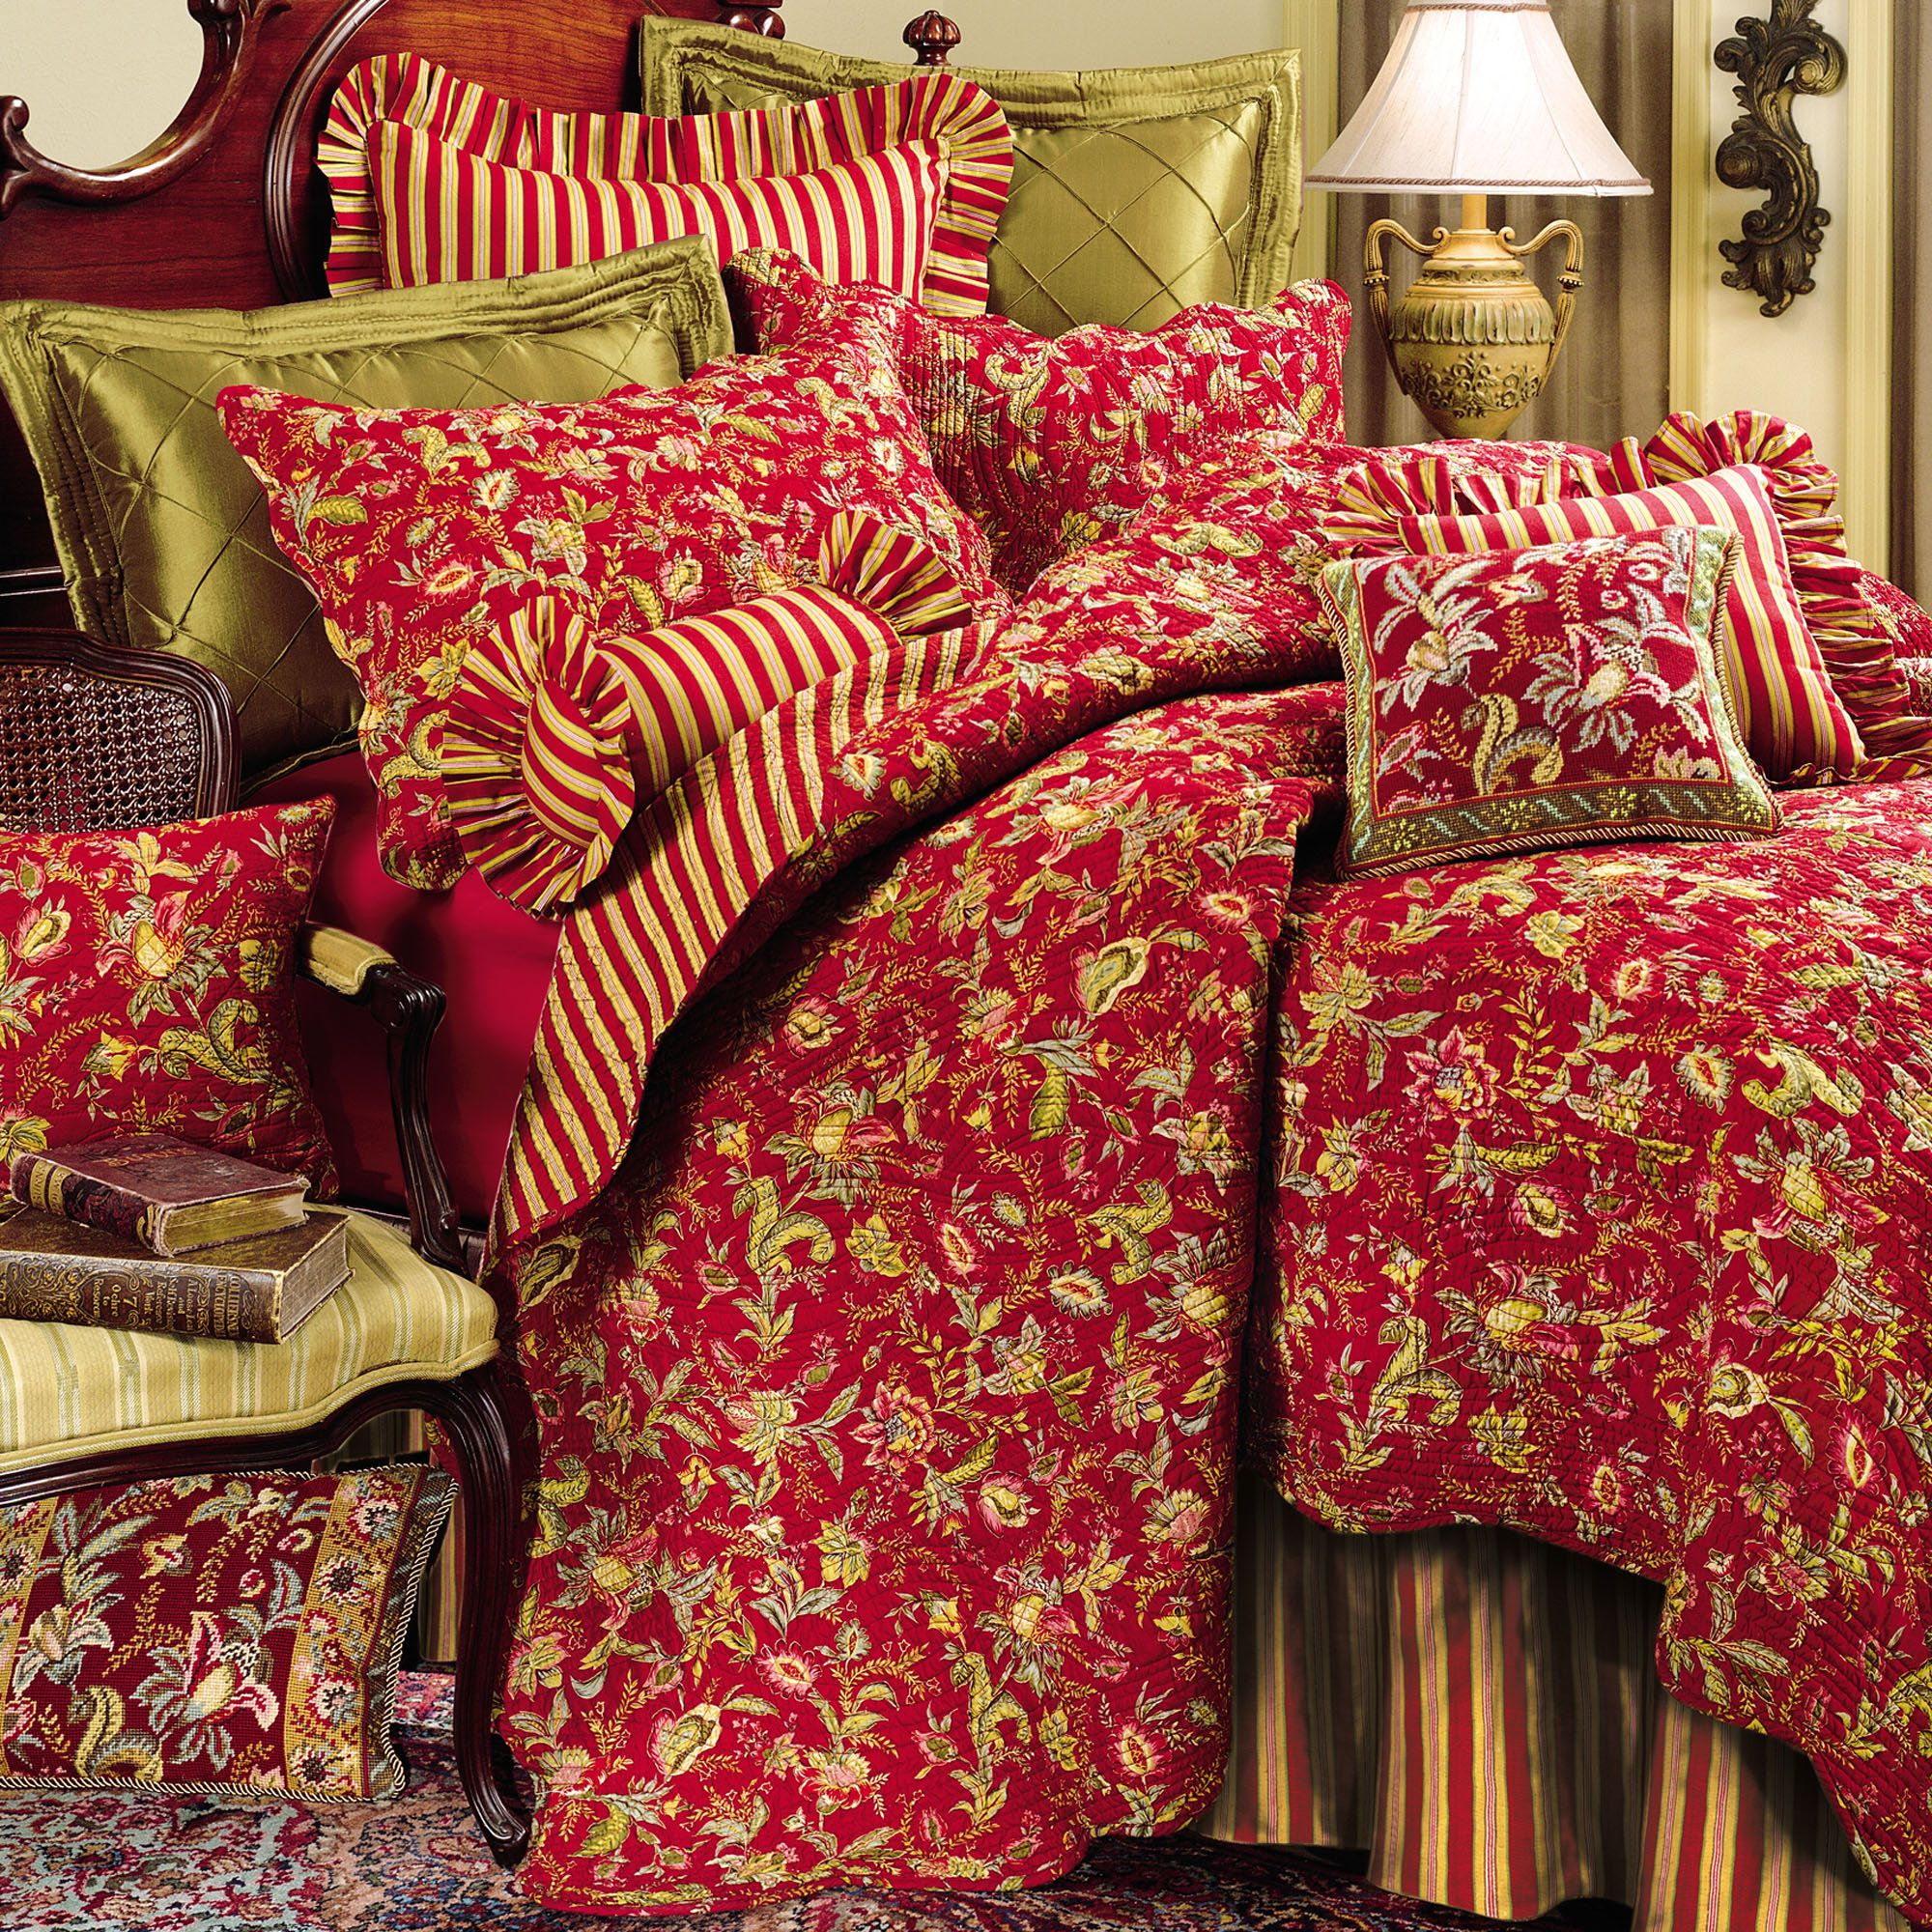 bag king size quilt bedding red in itm single bed super double odette set a